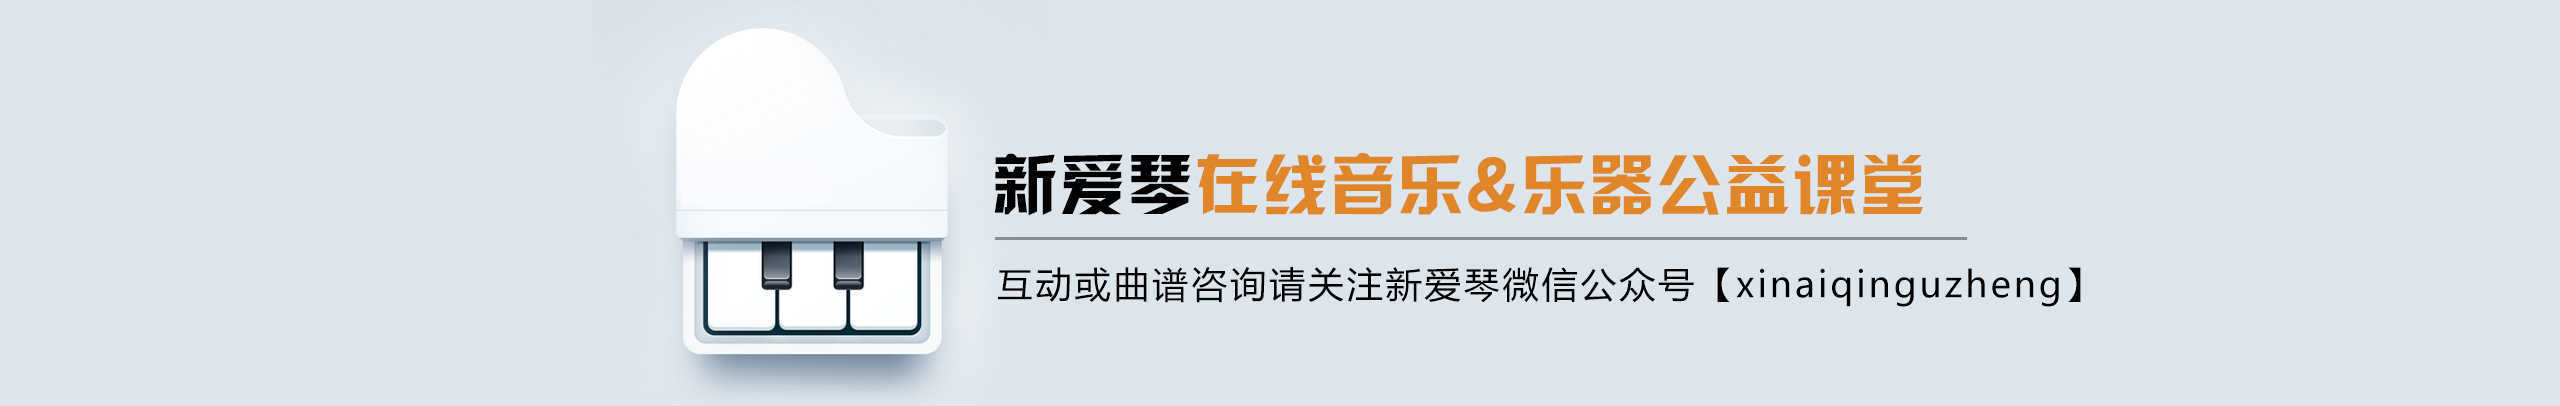 新爱琴乐器 banner